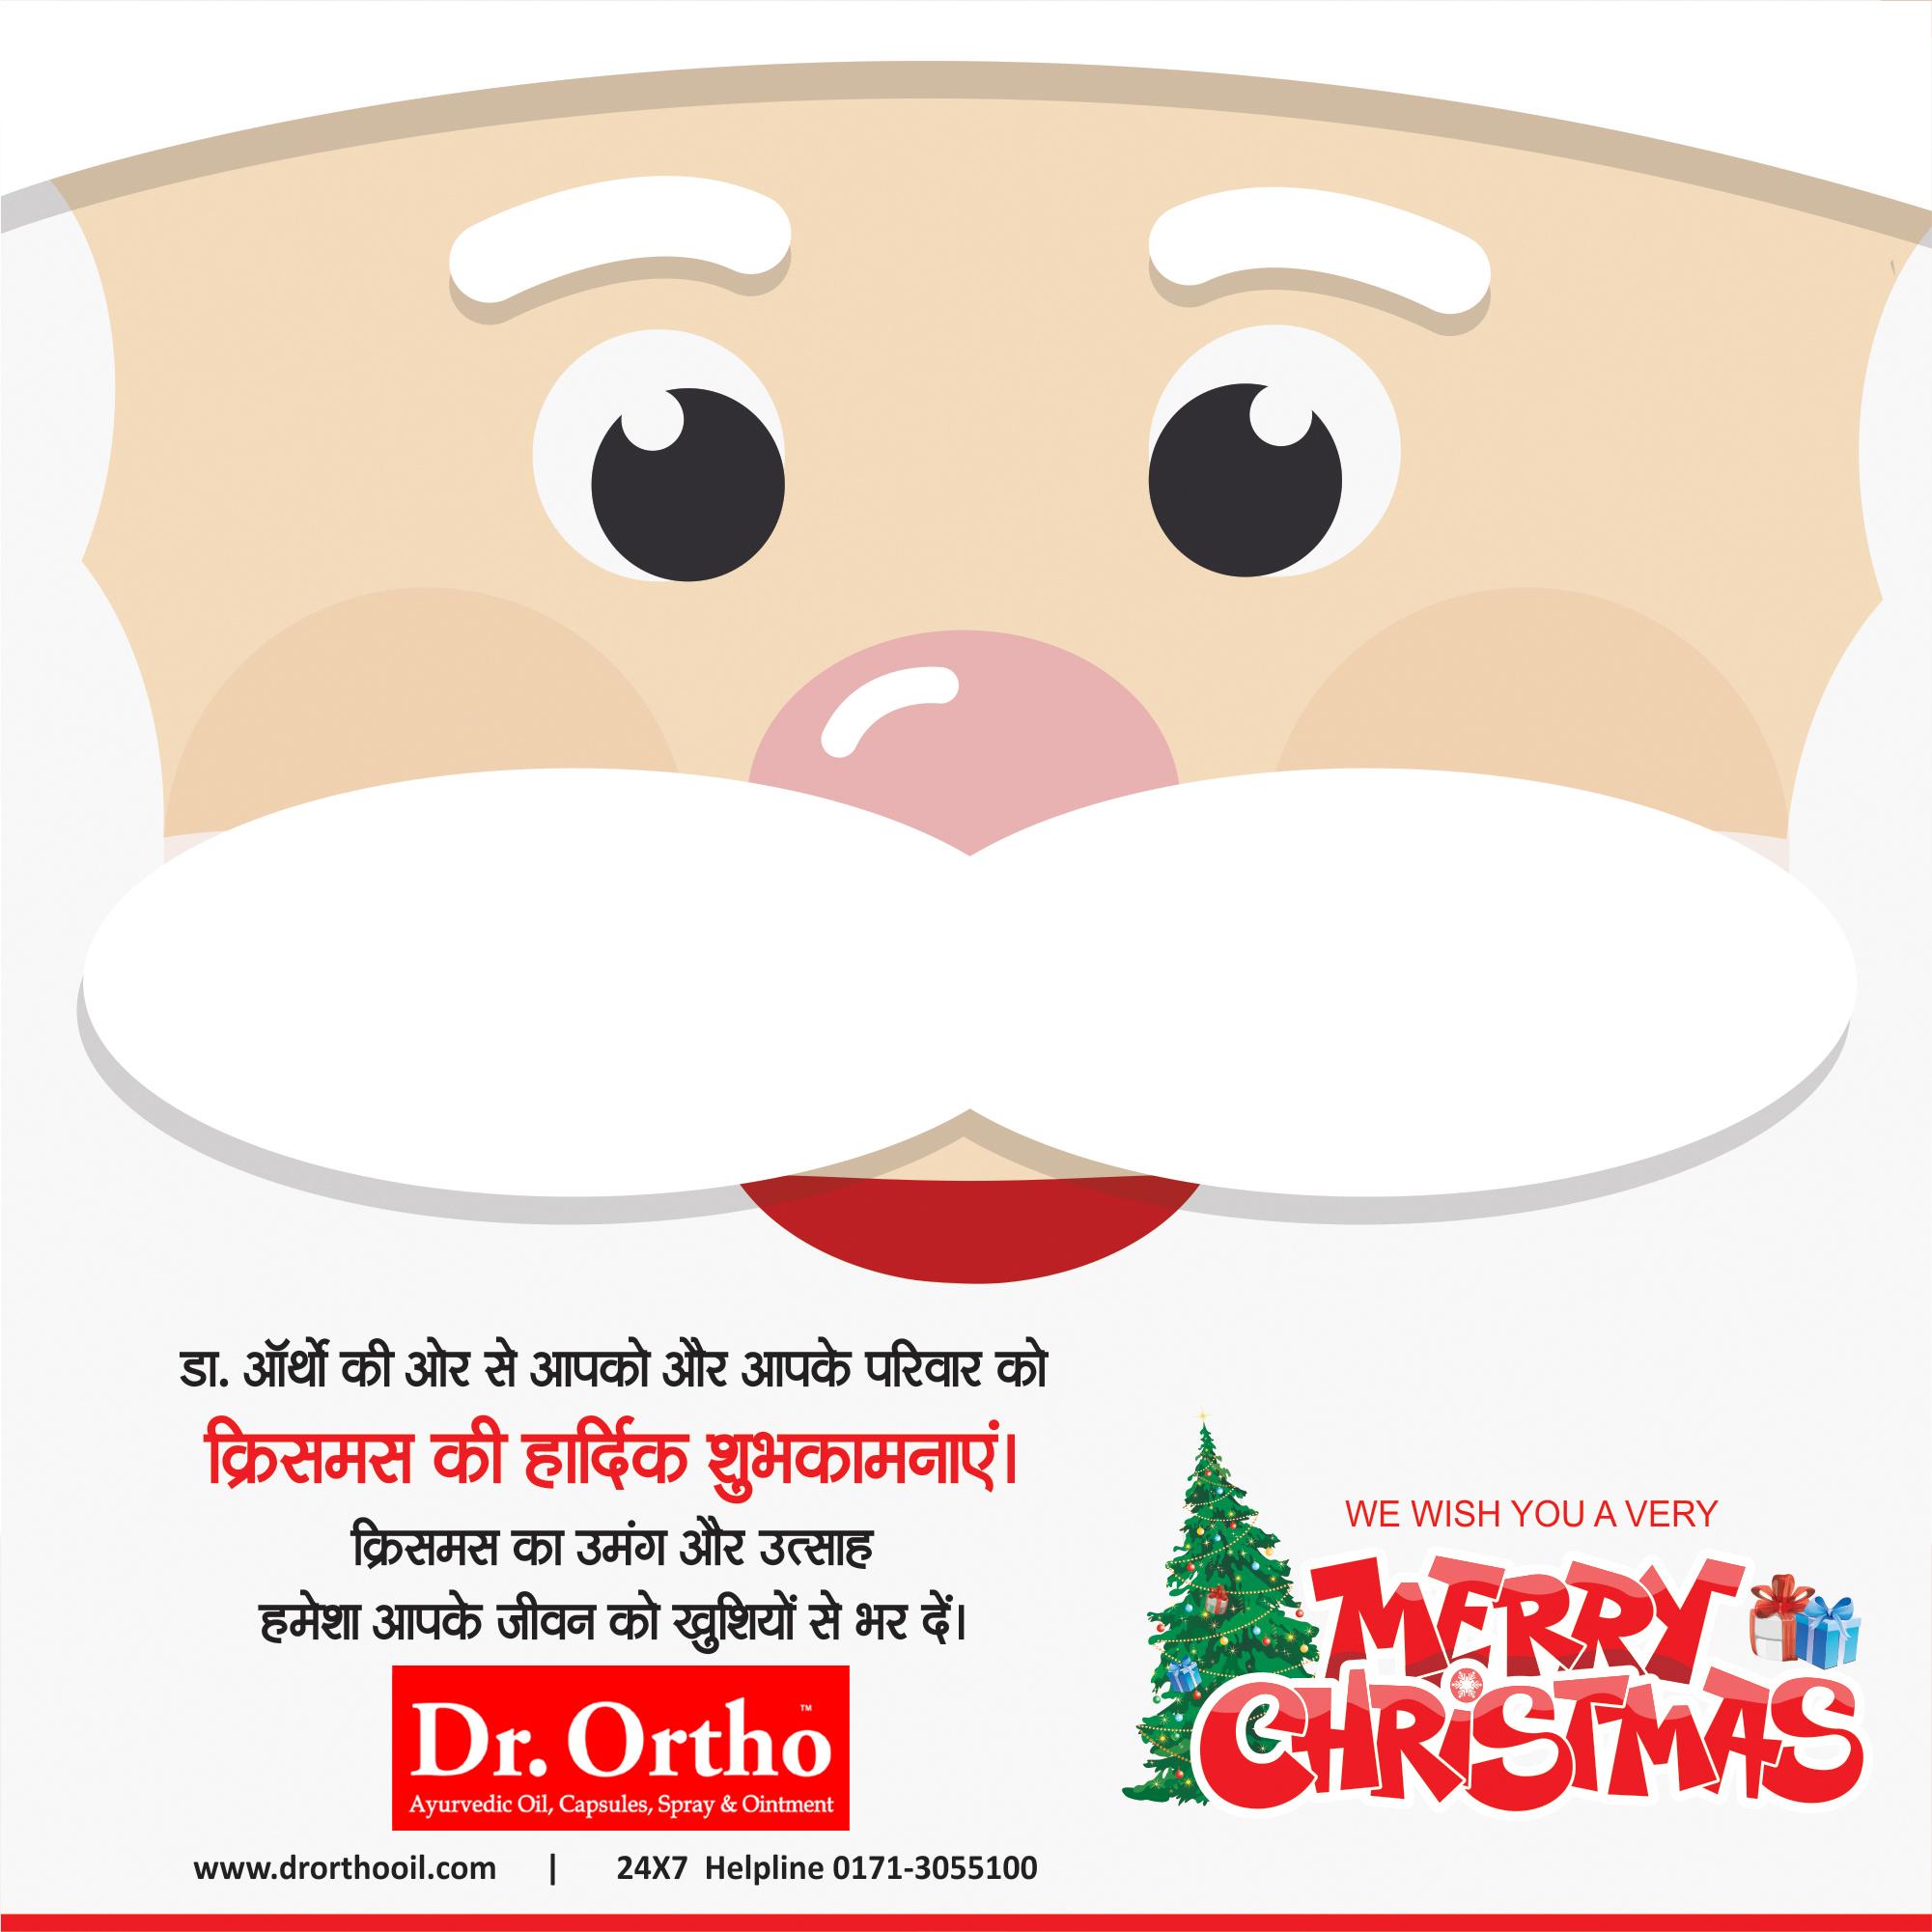 Merry Christmas   Dr Ortho Ayurvedic Oil Capsules 25 December 2017 Yakkuu